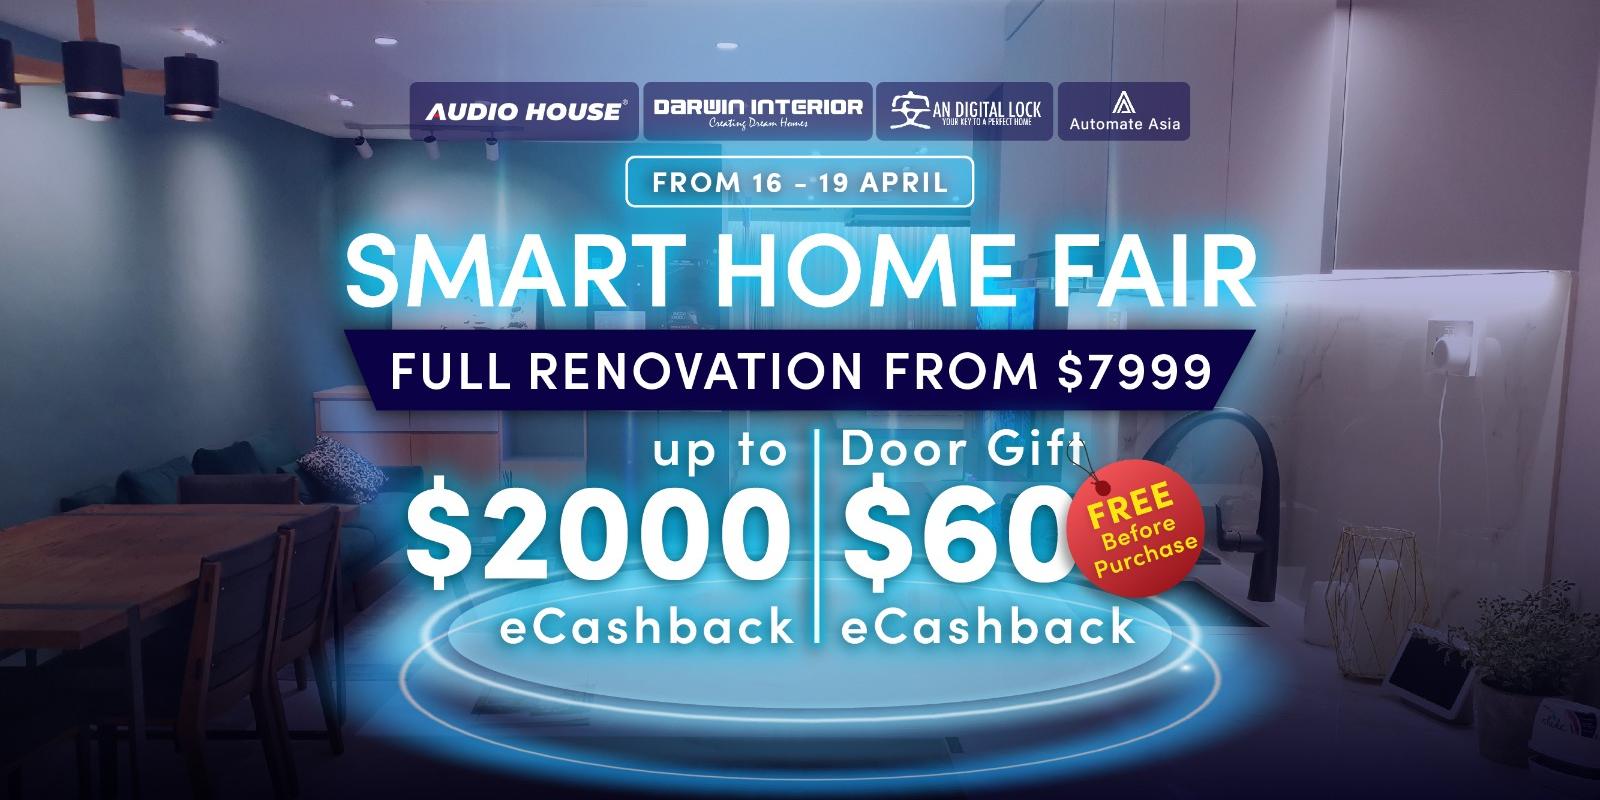 Audio House Smart Home x Vacuum x BTO Sale